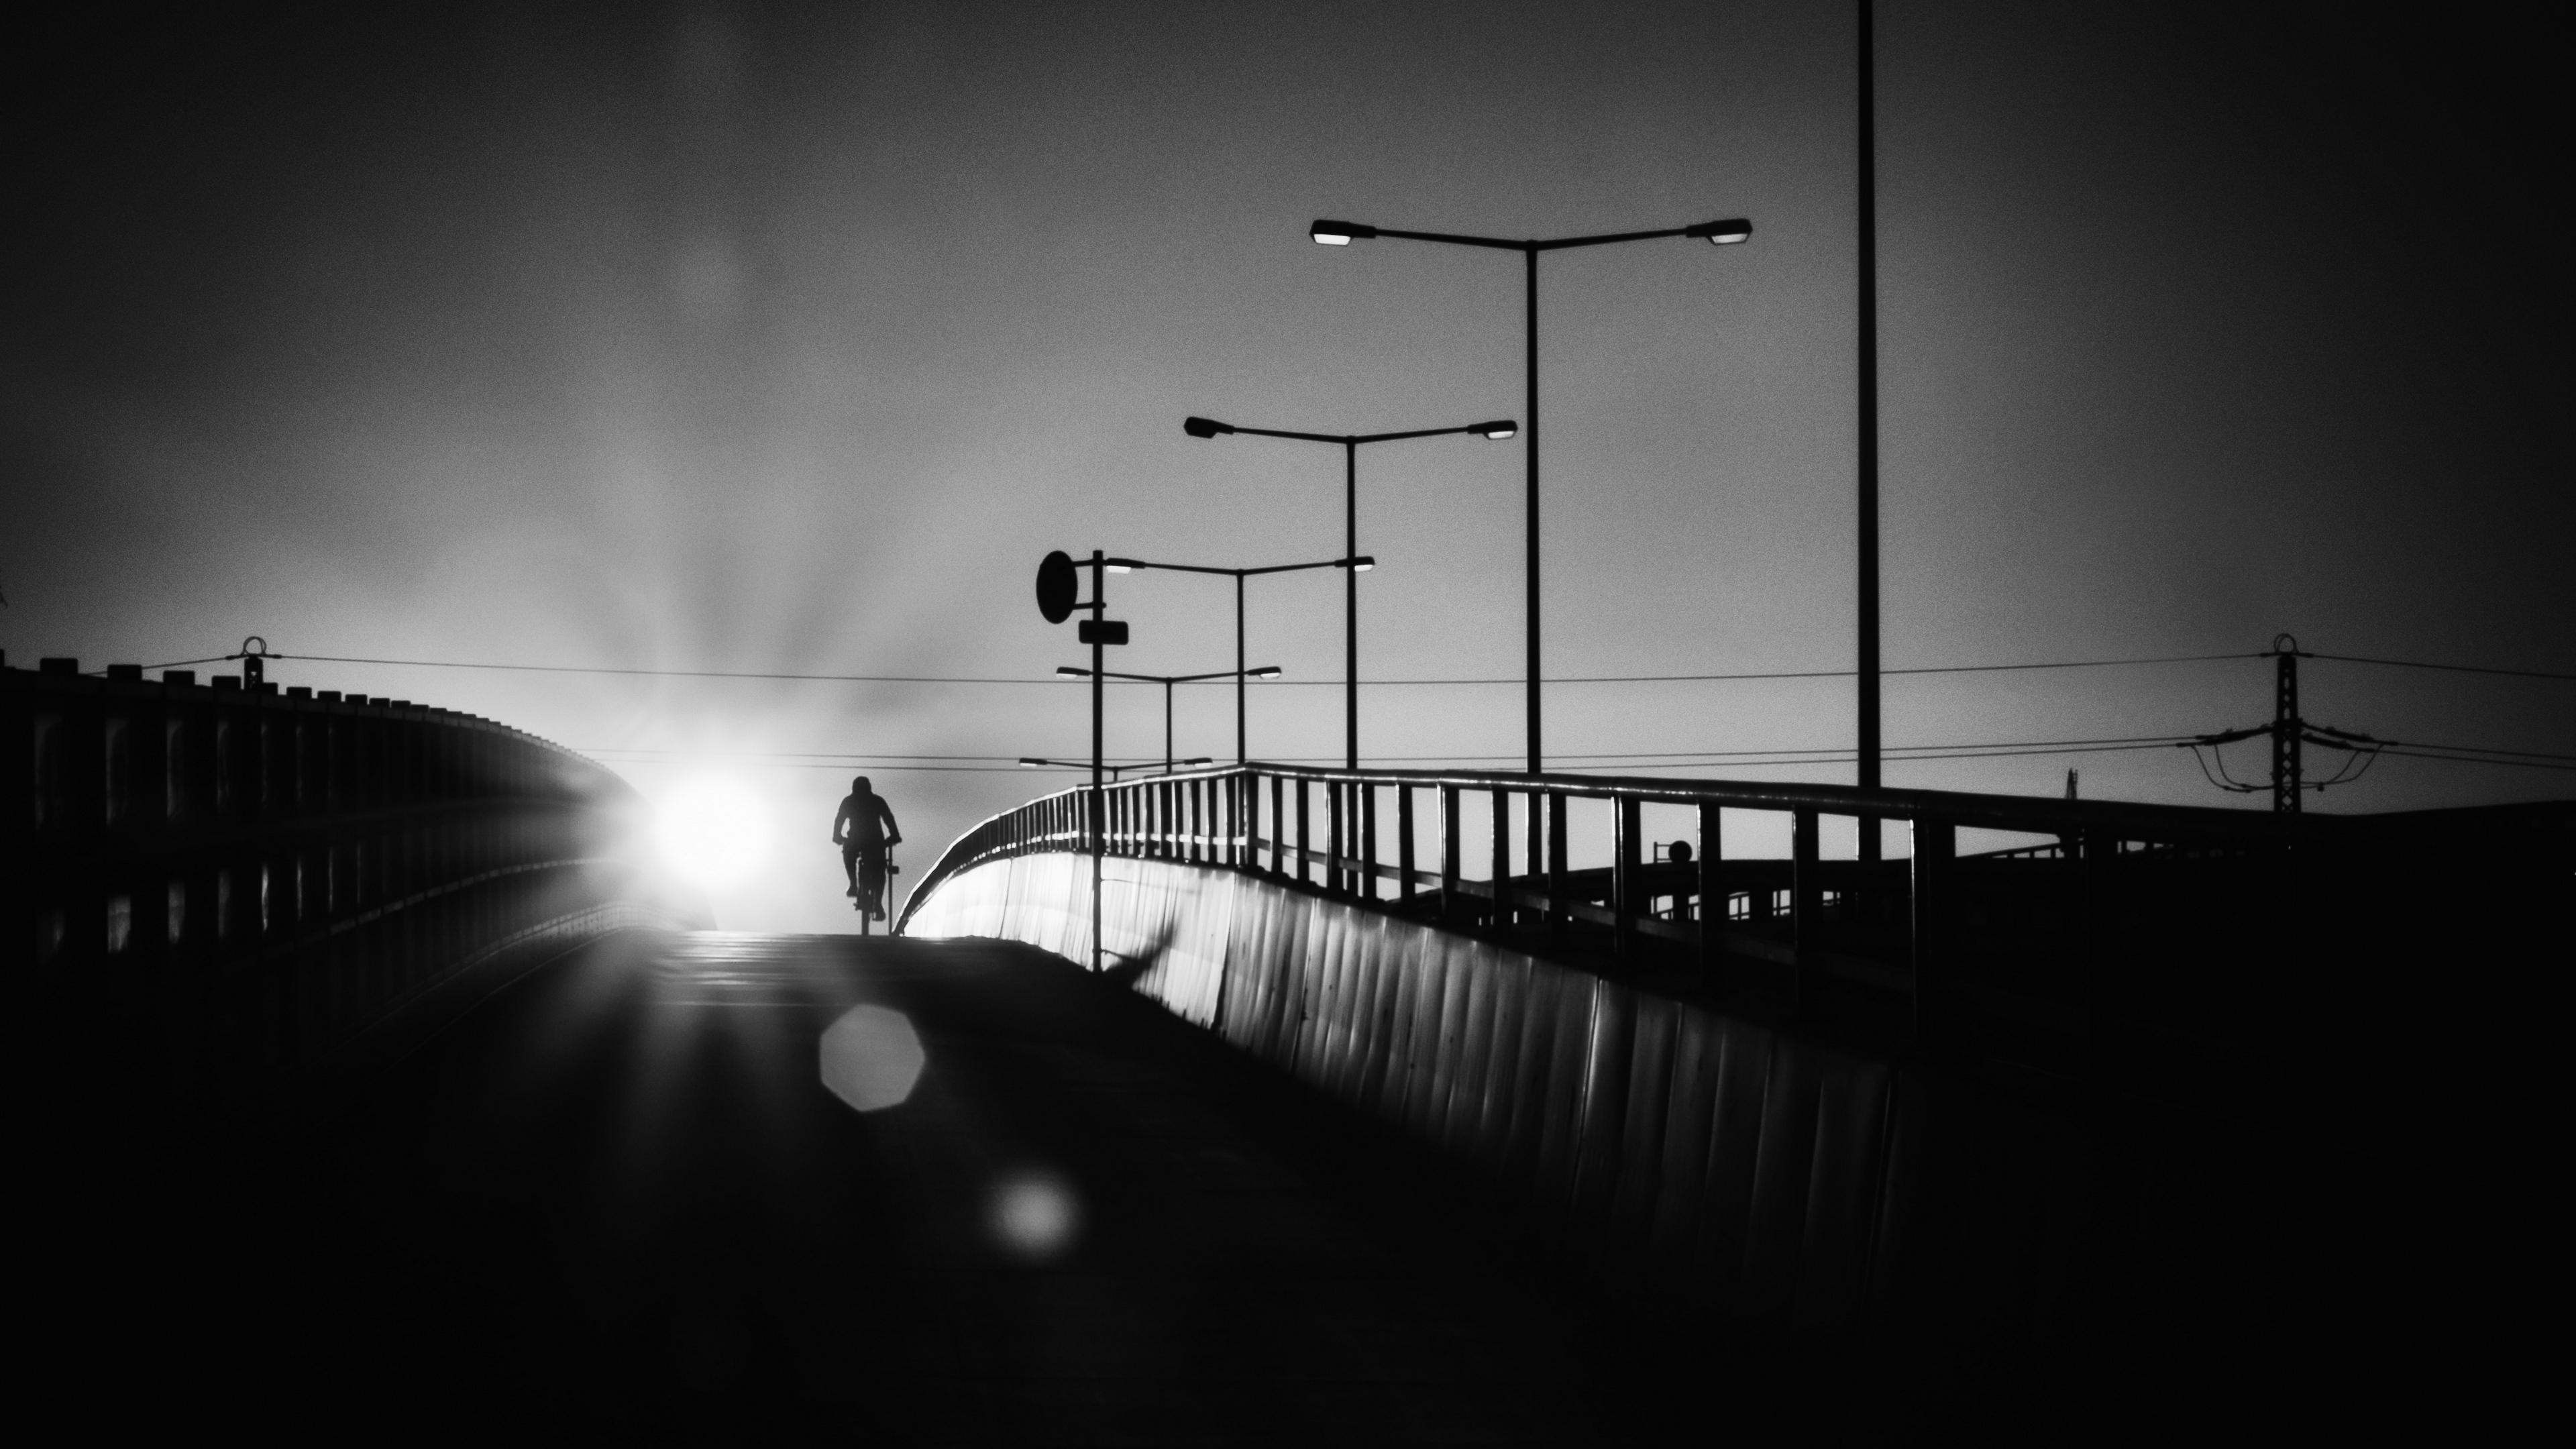 bicyclist bridge bw silhouette night 4k 1540575094 - bicyclist, bridge, bw, silhouette, night 4k - bw, bridge, bicyclist